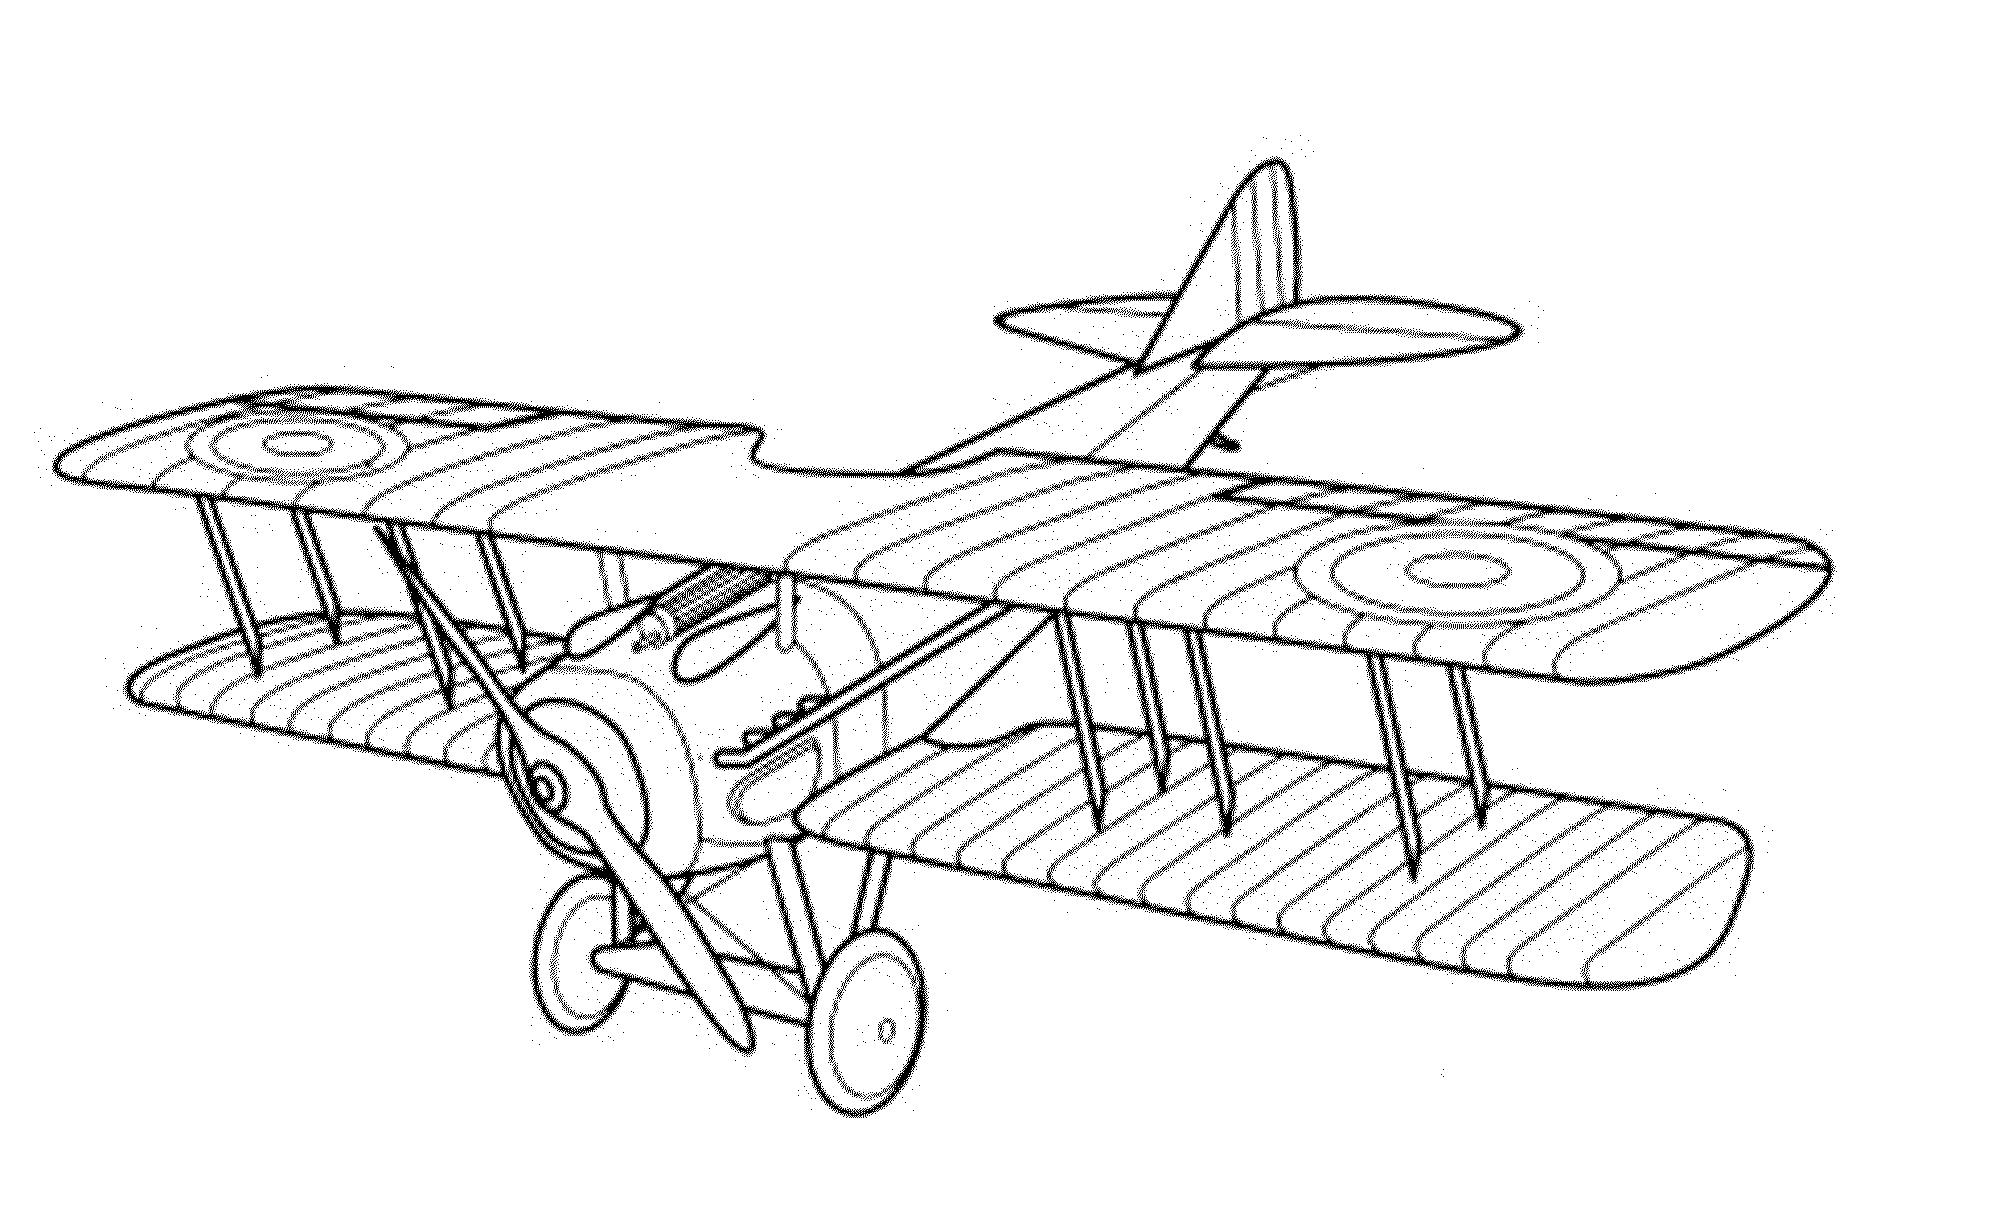 coloring page airplane free printable airplane coloring pages for kids airplane coloring page